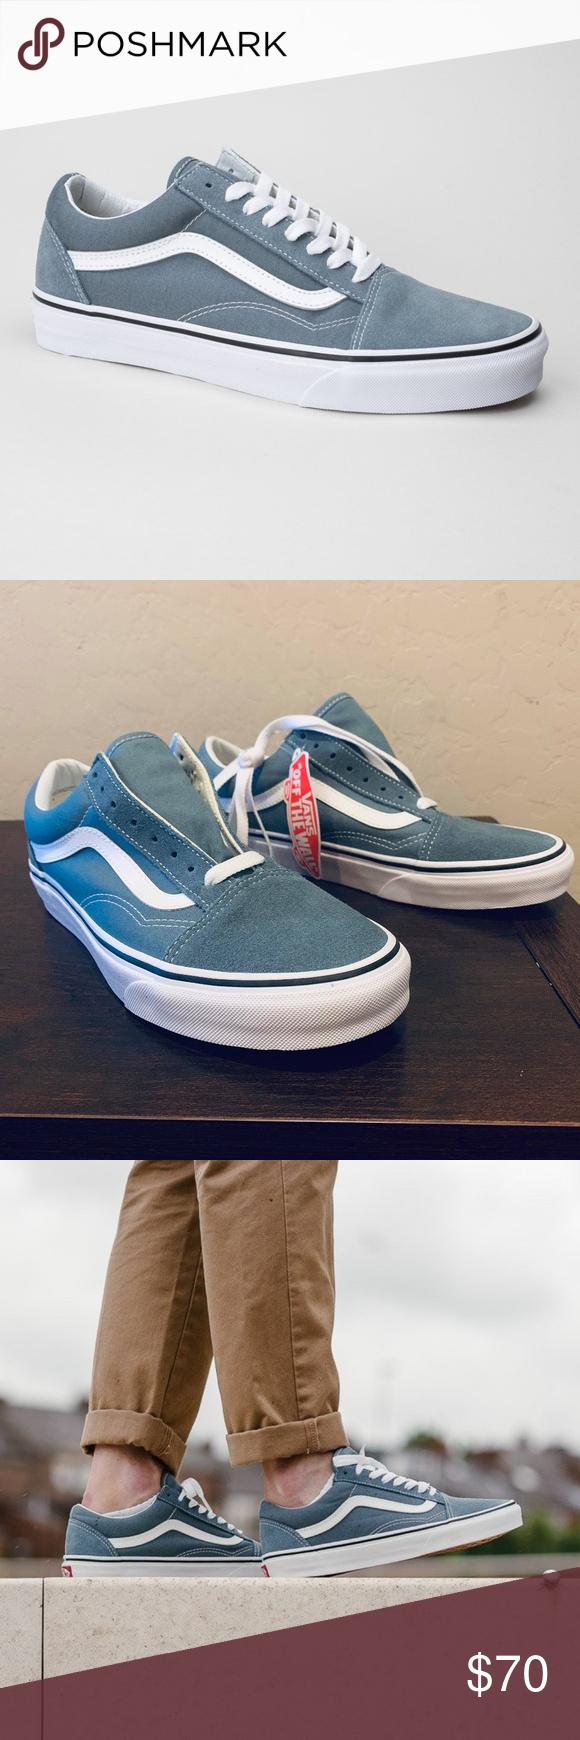 522839cbee Vans OLD SKOOL SKATE Shoes Goblin Blue Men s NEW AUTHENTIC Vans Old Skool  Skate Shoes SIZE